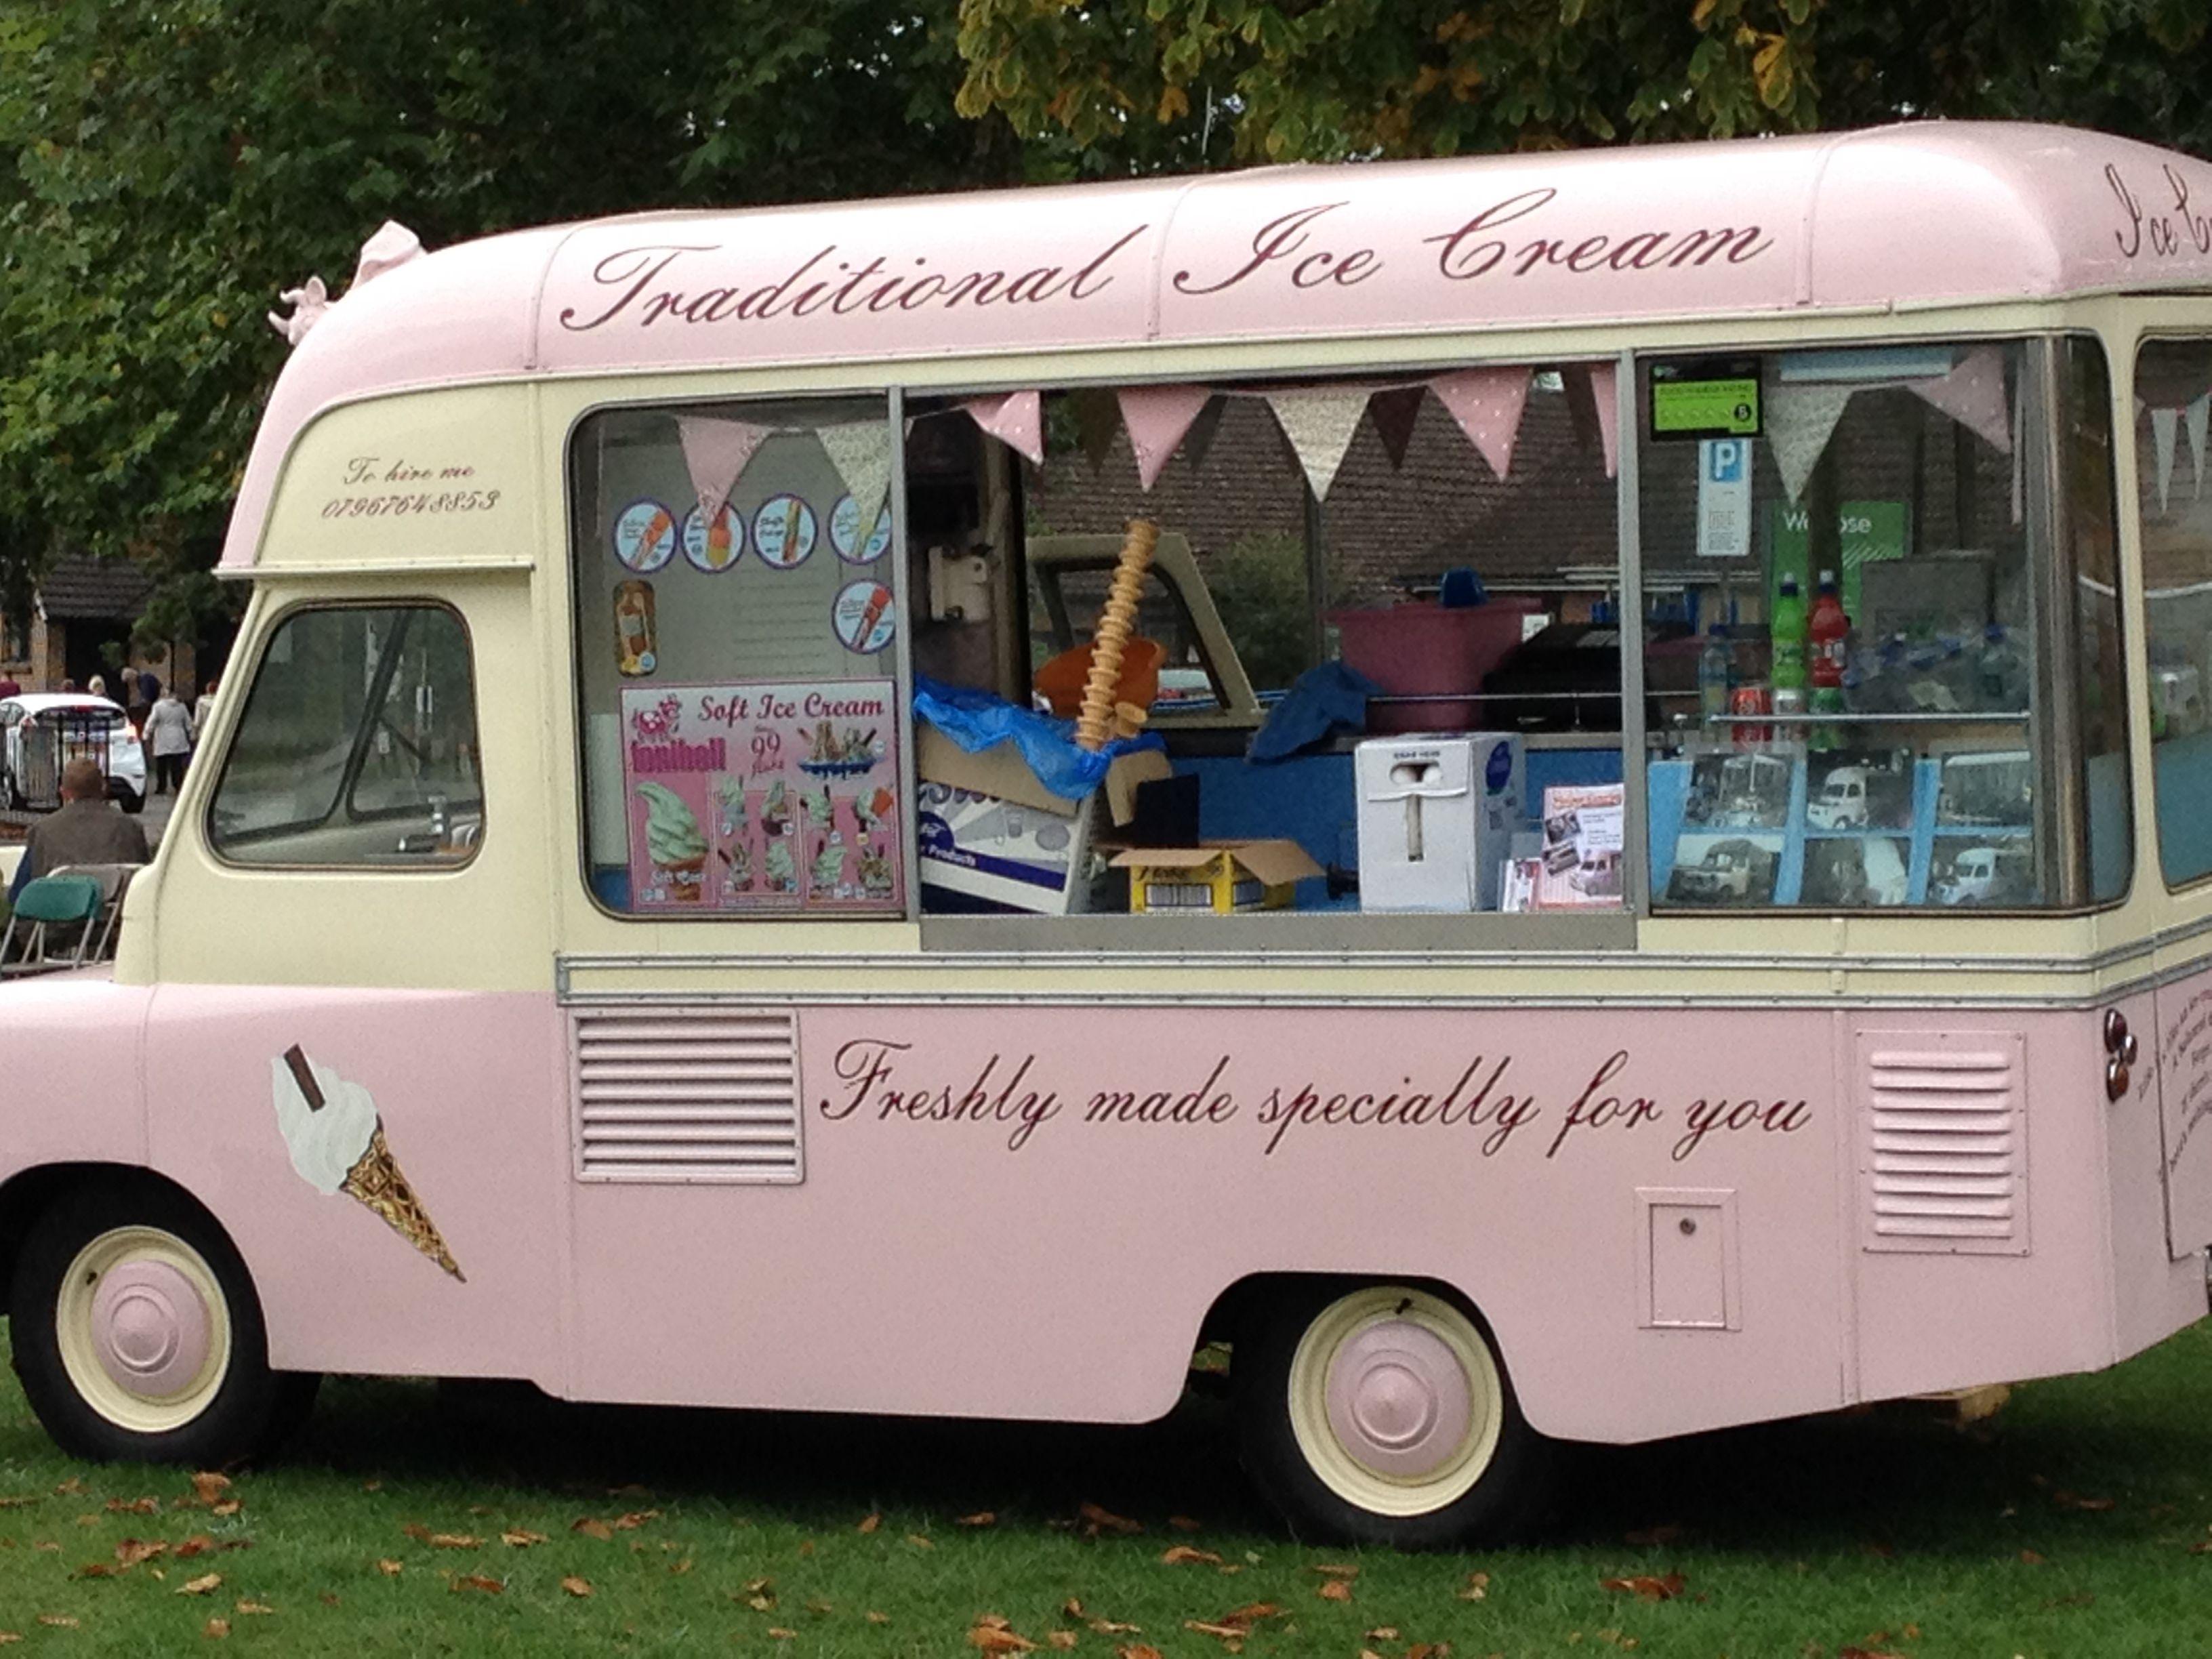 Smiths of Gateshead ice cream van